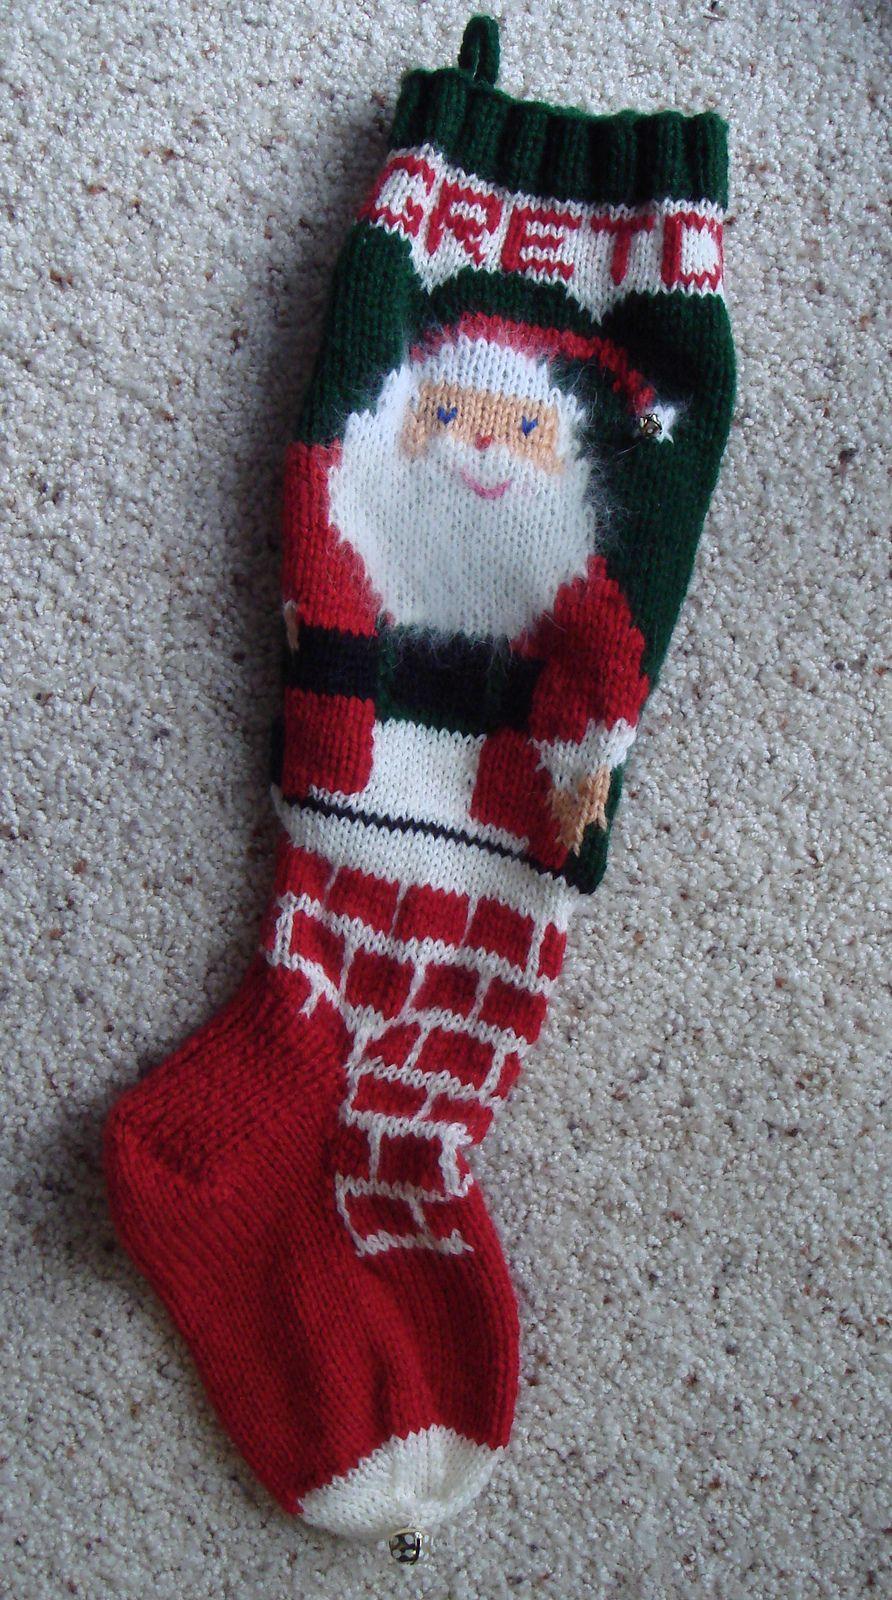 Ravelry: carolyninAlaska's Christmas stockings | Knitted ...